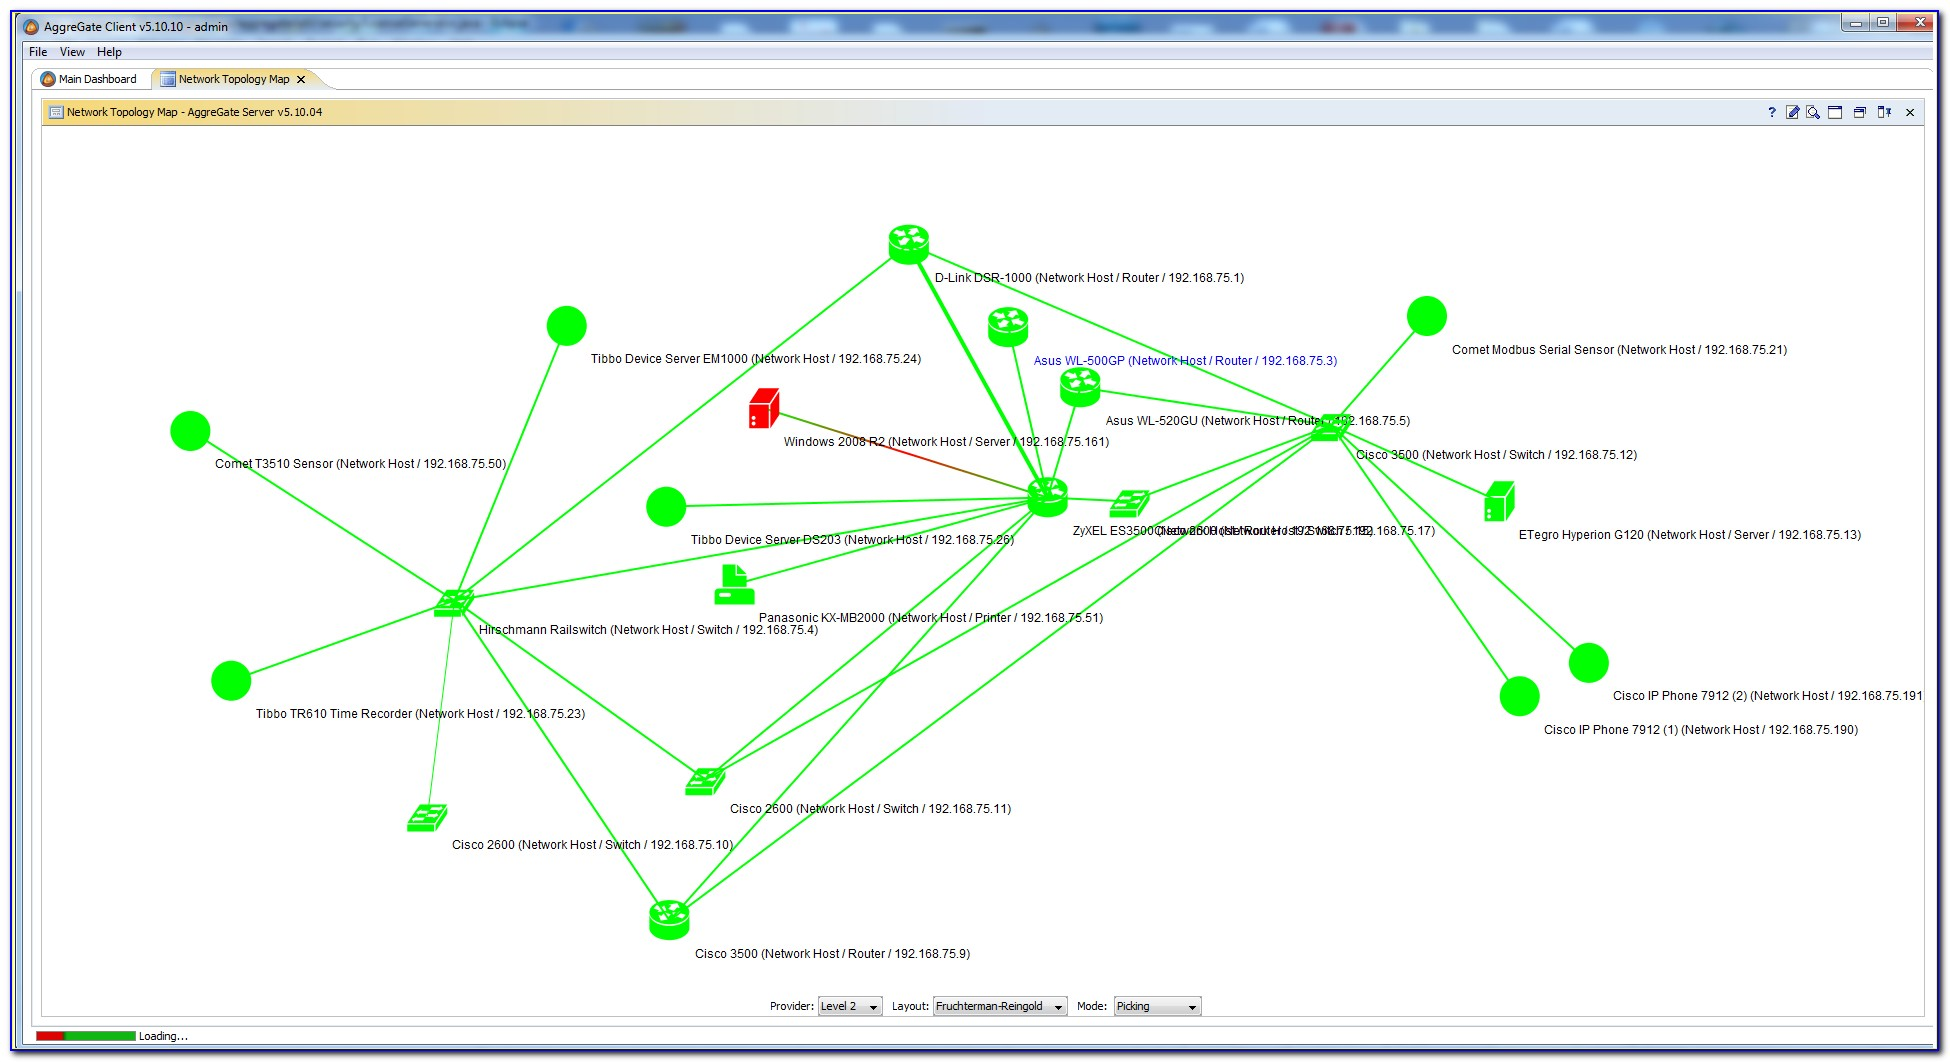 Google Map Network Topology